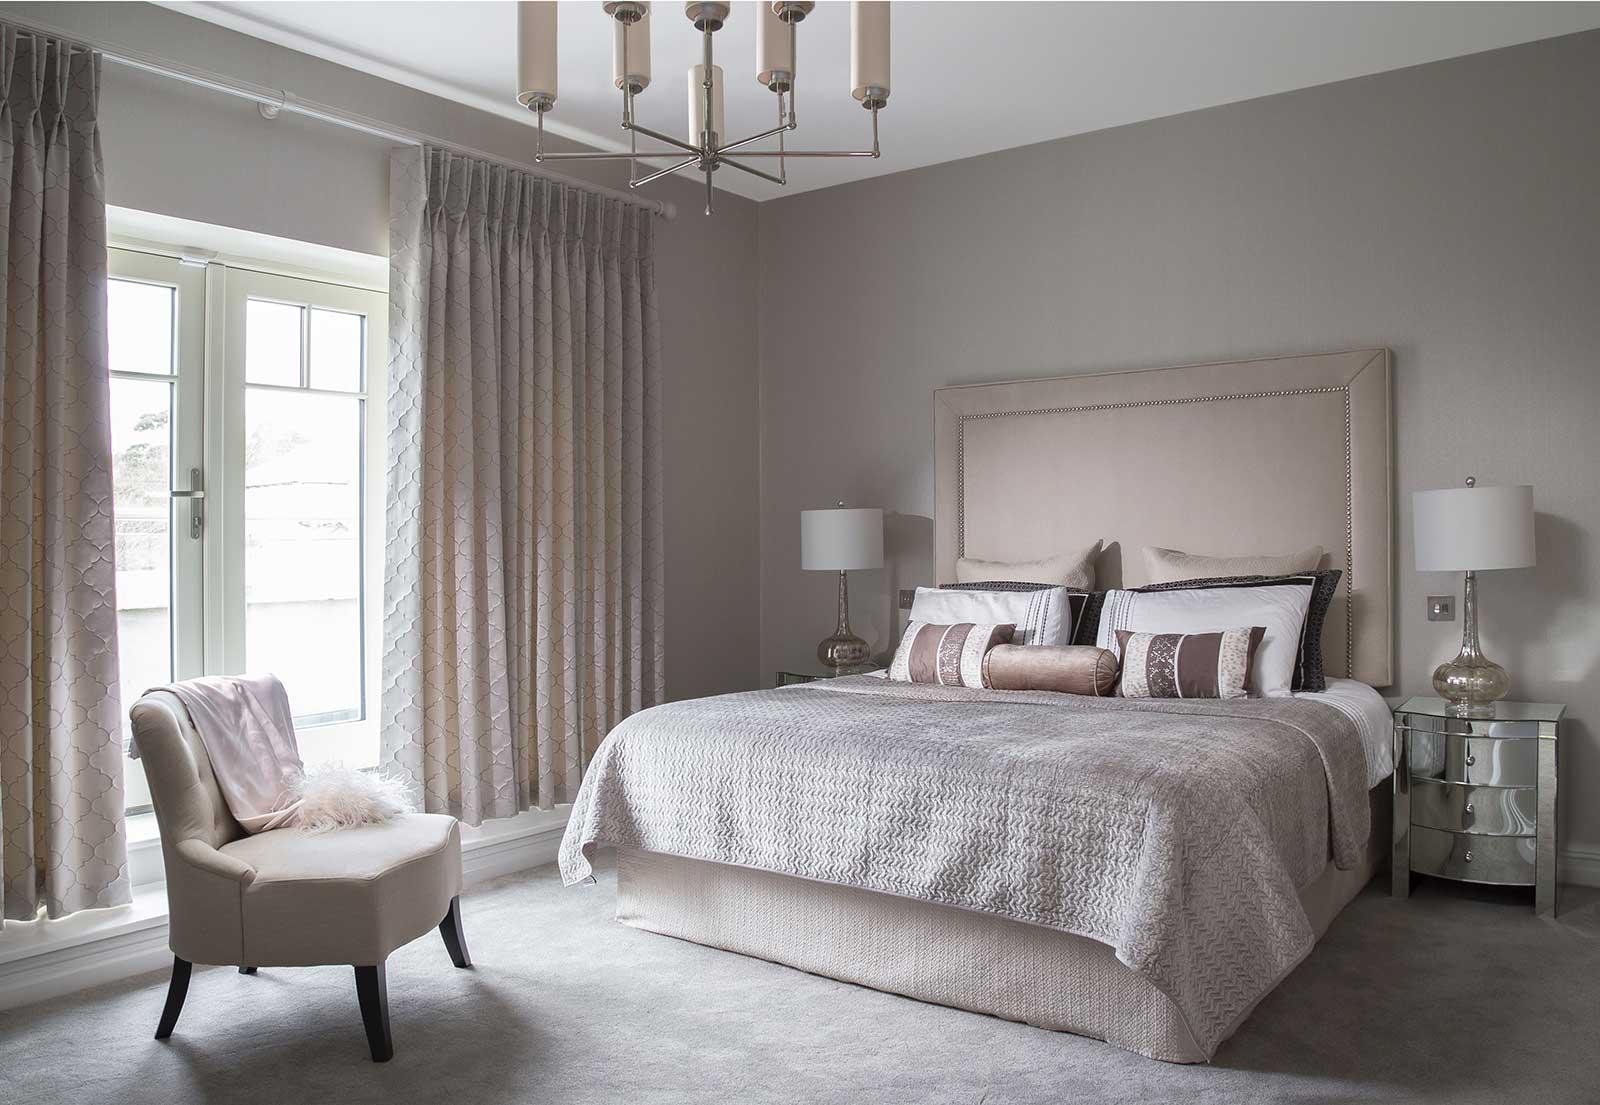 Carton-Interiors_P6_19_Bedroom